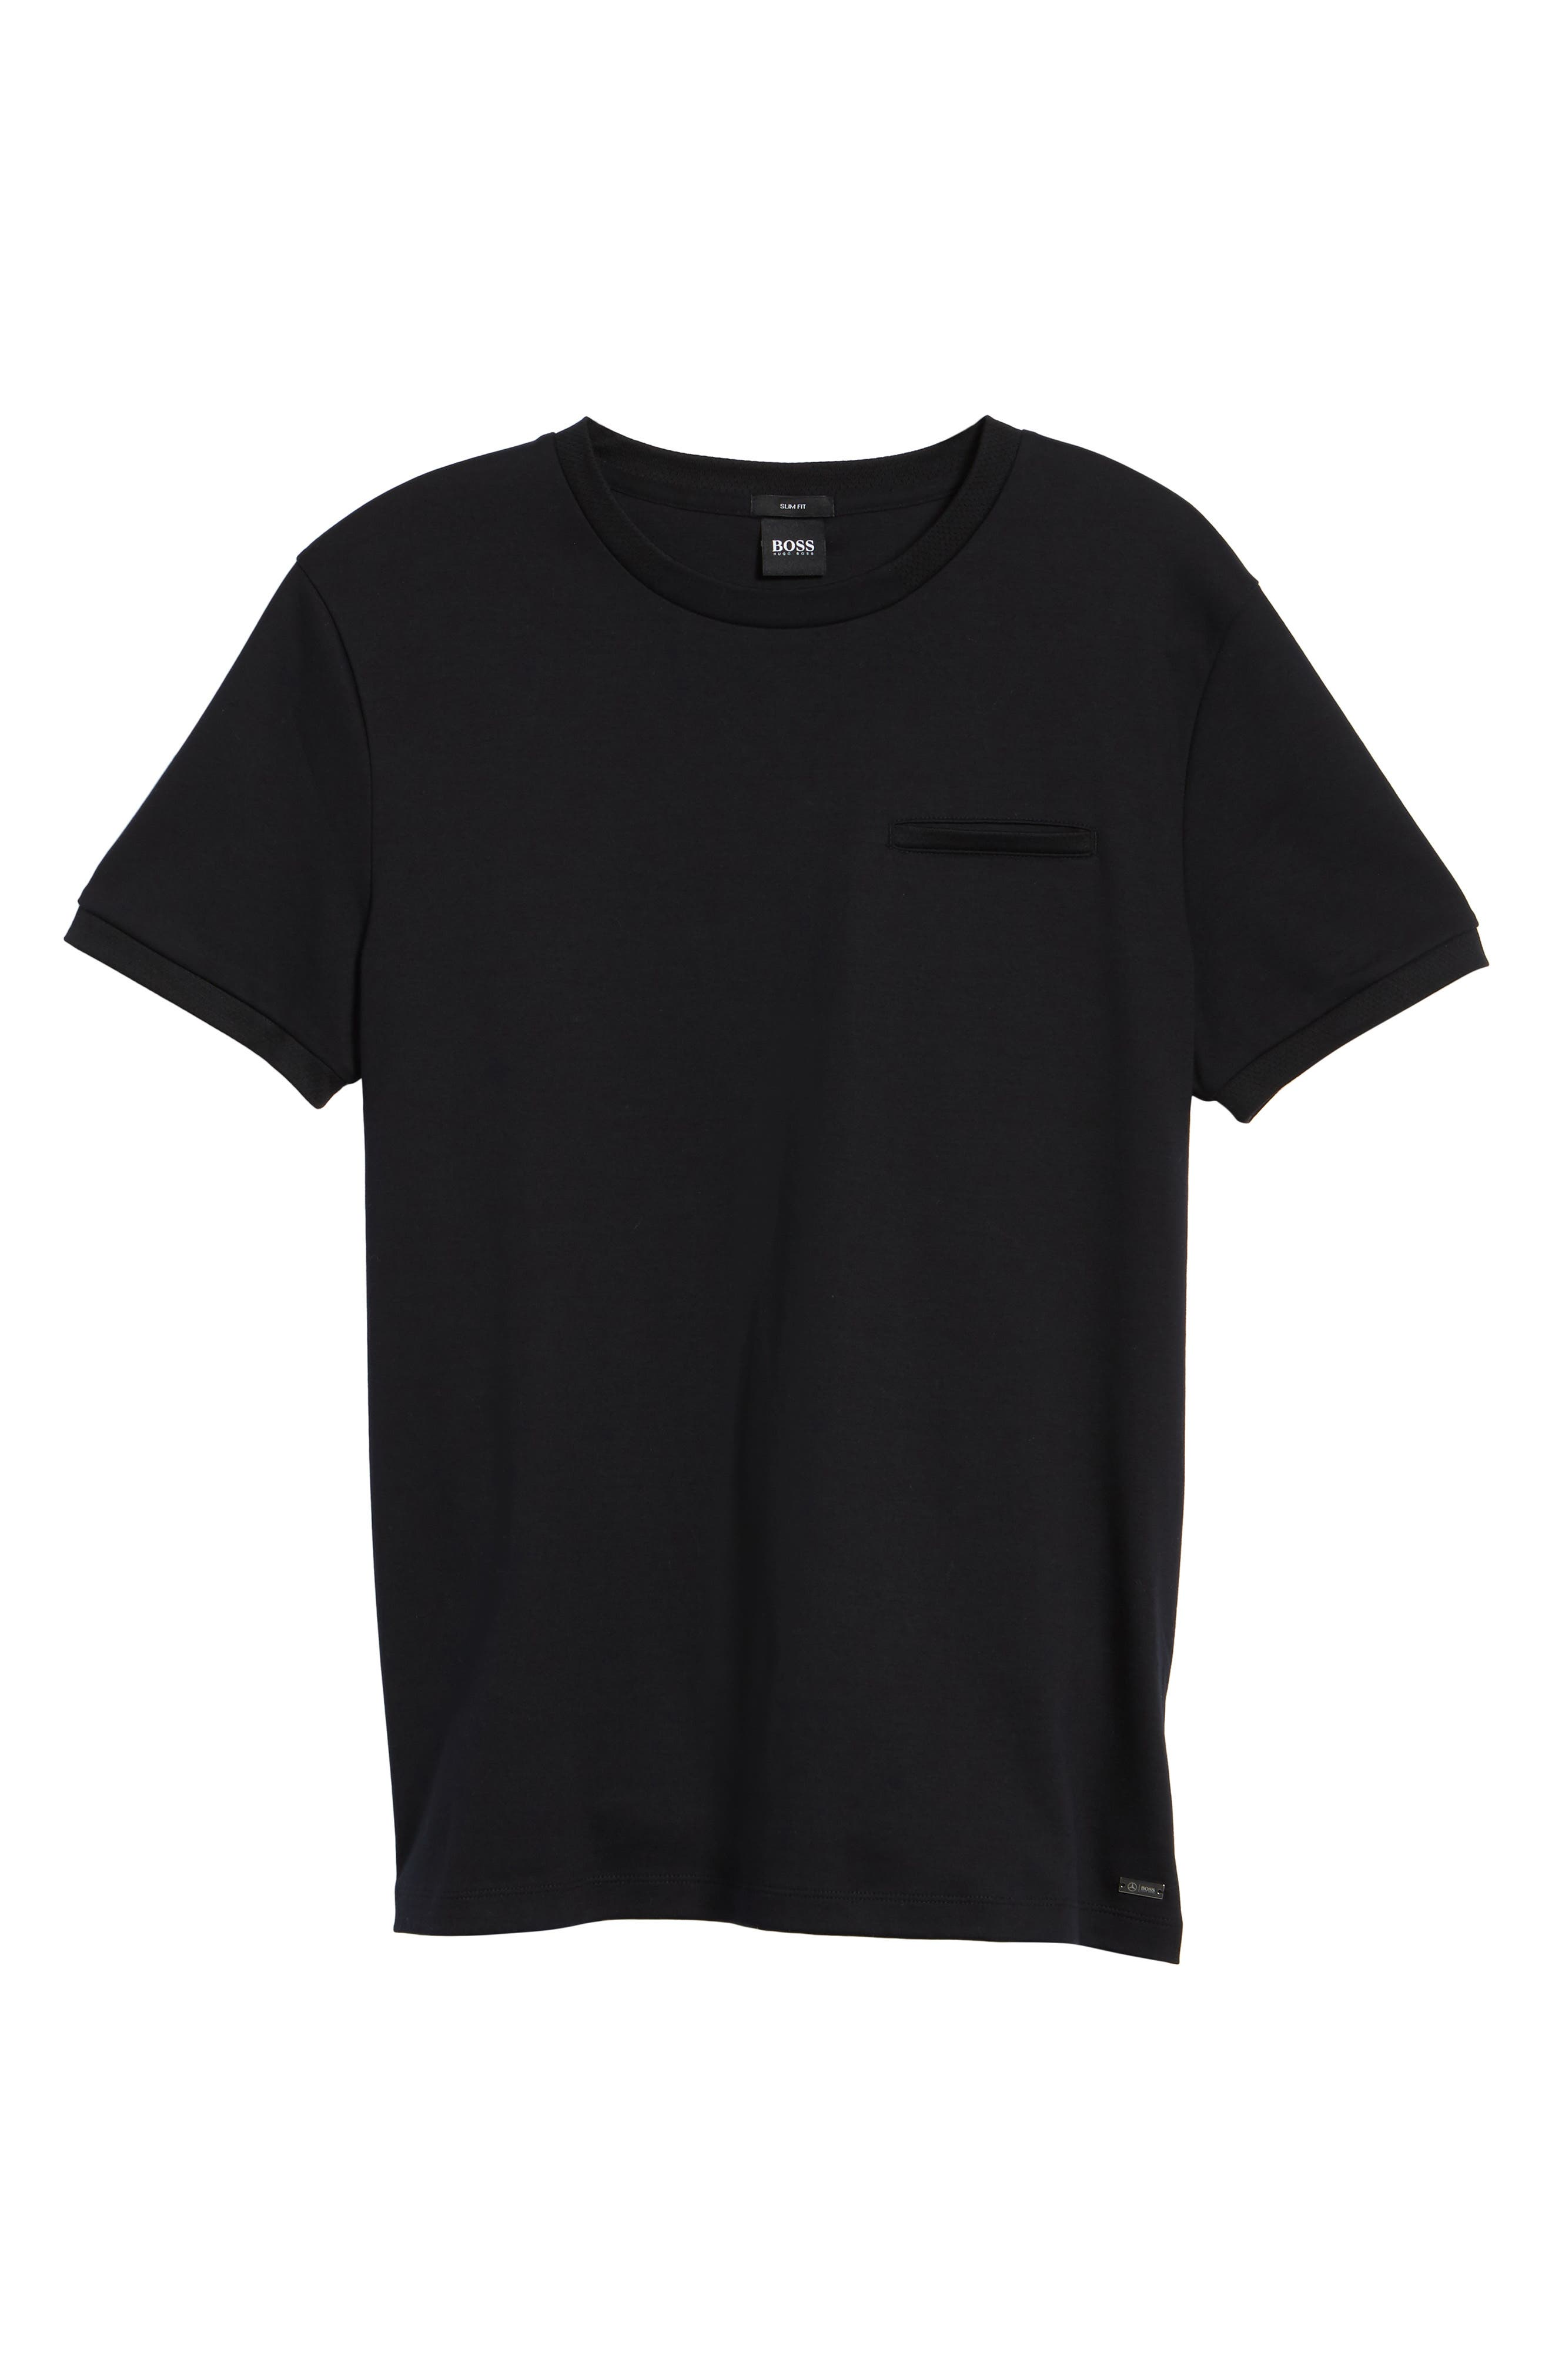 Tessler Mercedes Slim Fit Crewneck T-Shirt,                             Alternate thumbnail 6, color,                             Black